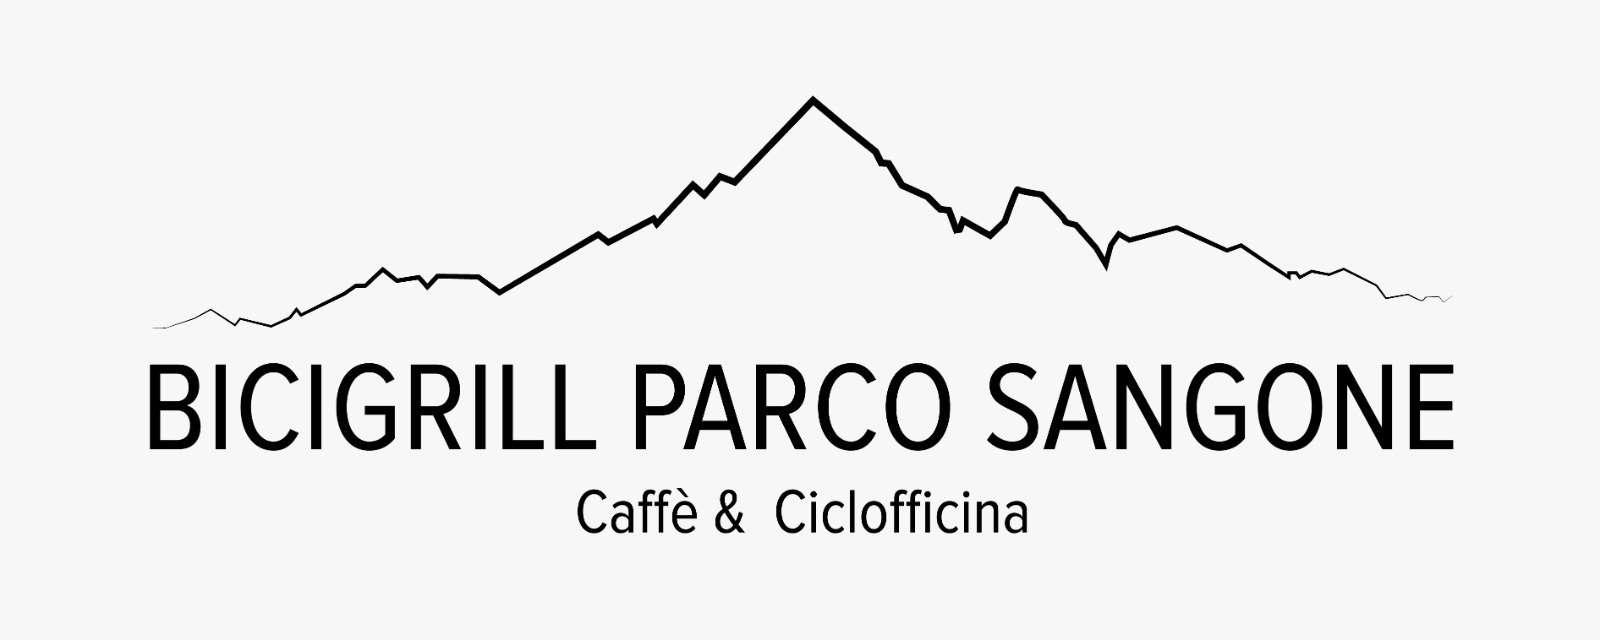 Bicigrill Parco Sangone